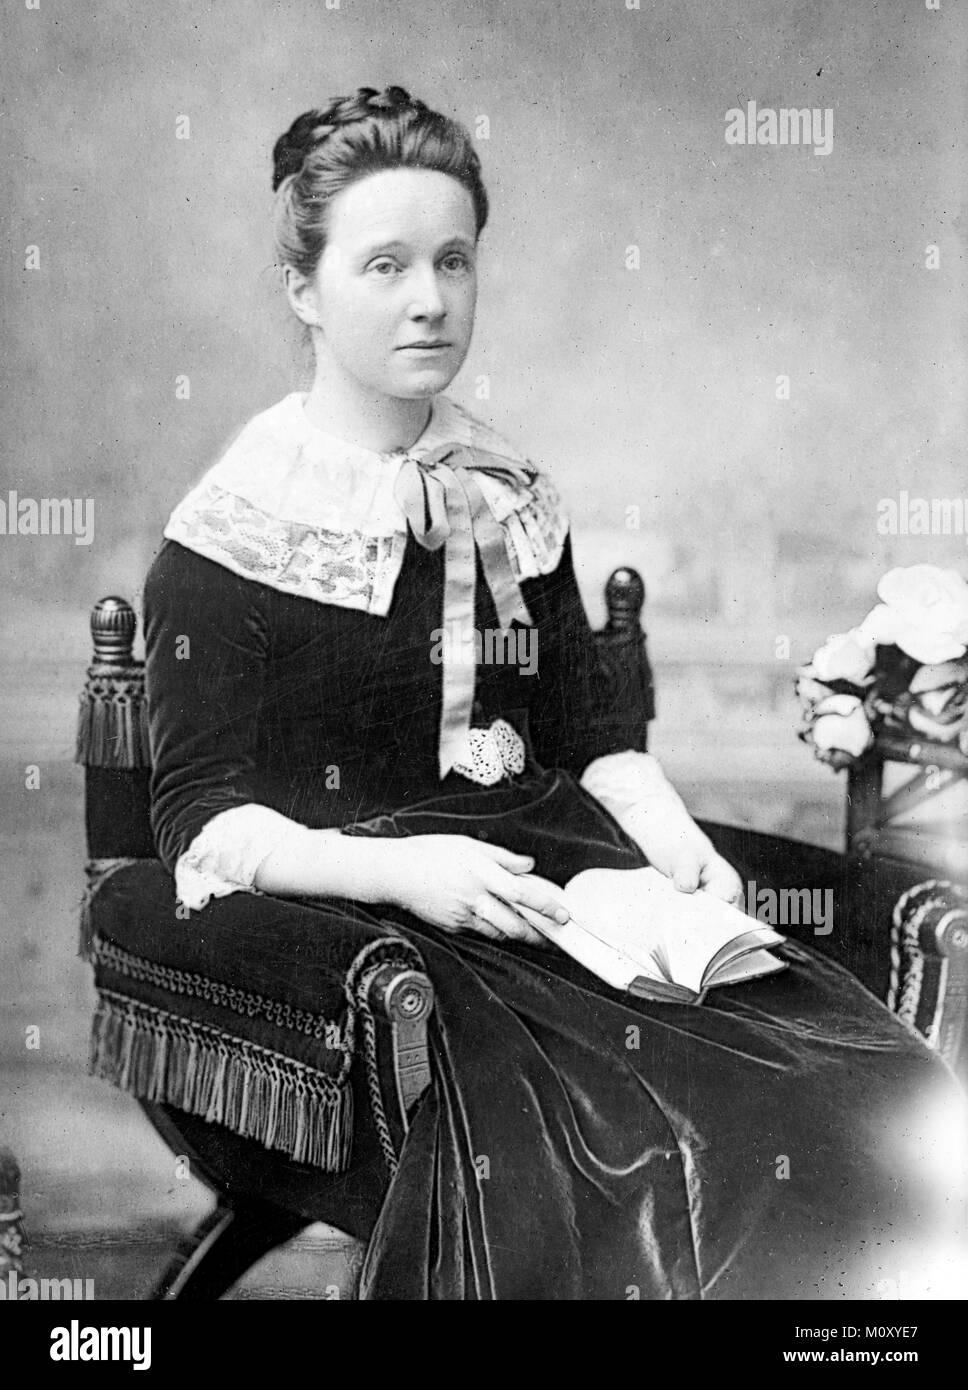 Millicent Fawcett, Mrs. Millicent Fawcett, Dame Millicent Garrett Fawcett, (1847 – 1929) British feminist and writer. Campaigner for women to have the vote. Stock Photo